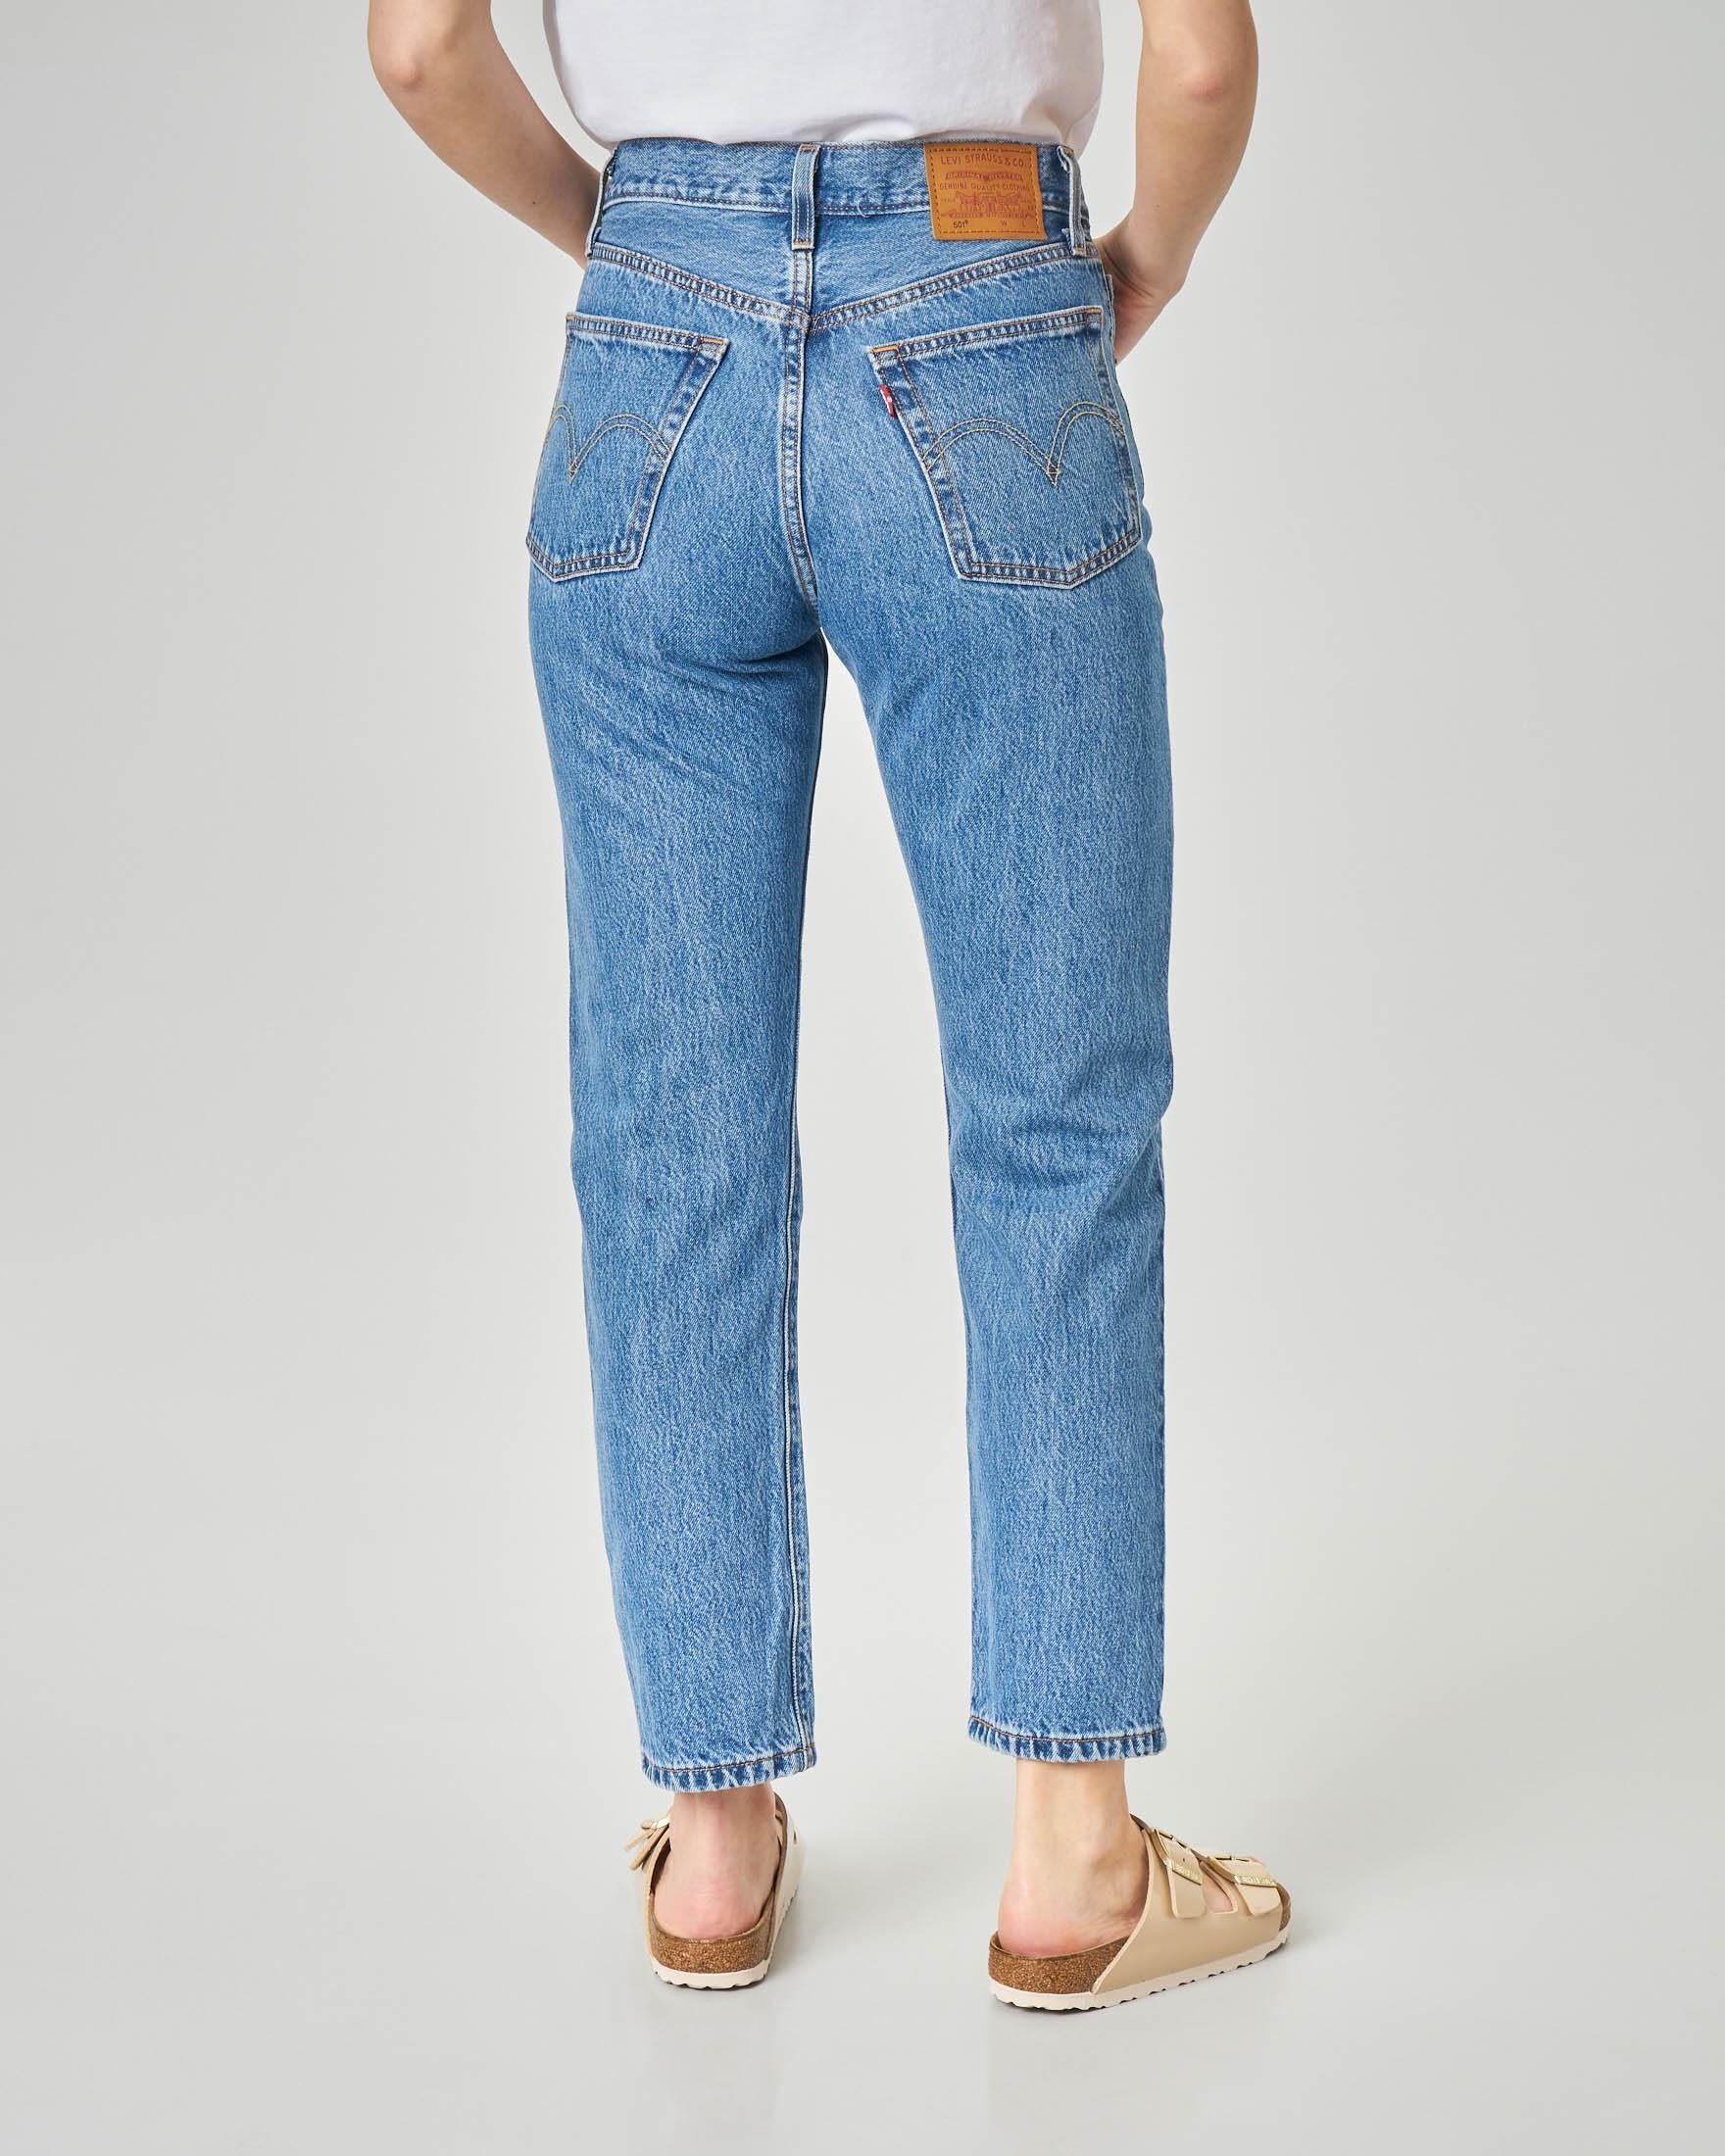 Jeans 501 blu super stone washed lunghezza alla caviglia